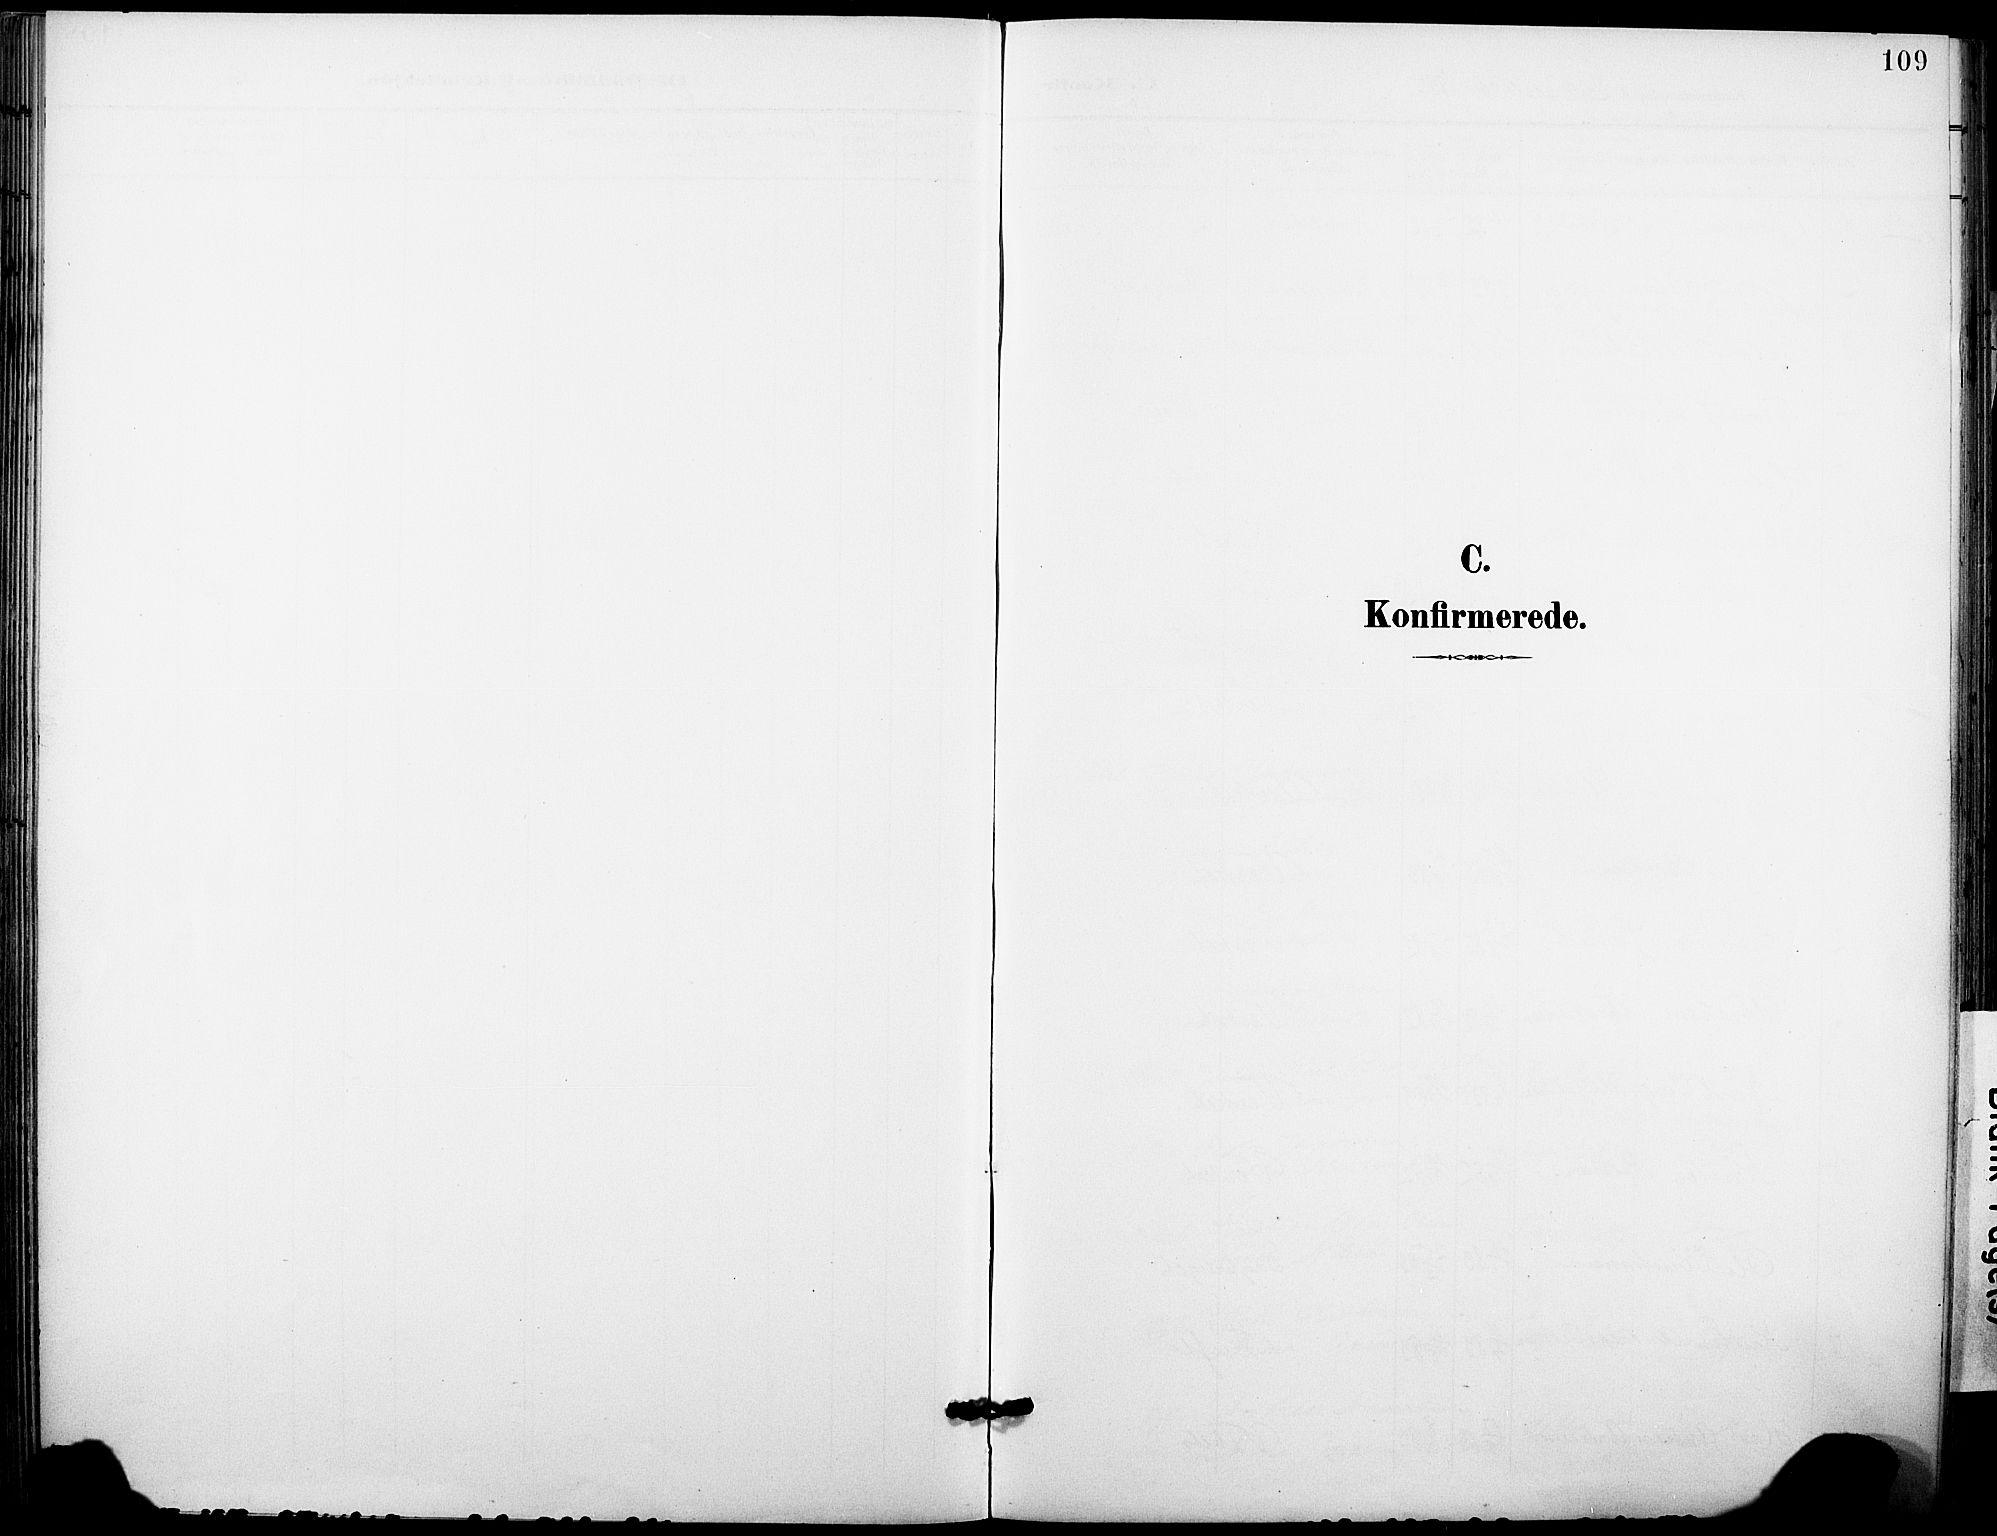 SAKO, Holla kirkebøker, F/Fa/L0010: Ministerialbok nr. 10, 1897-1907, s. 109